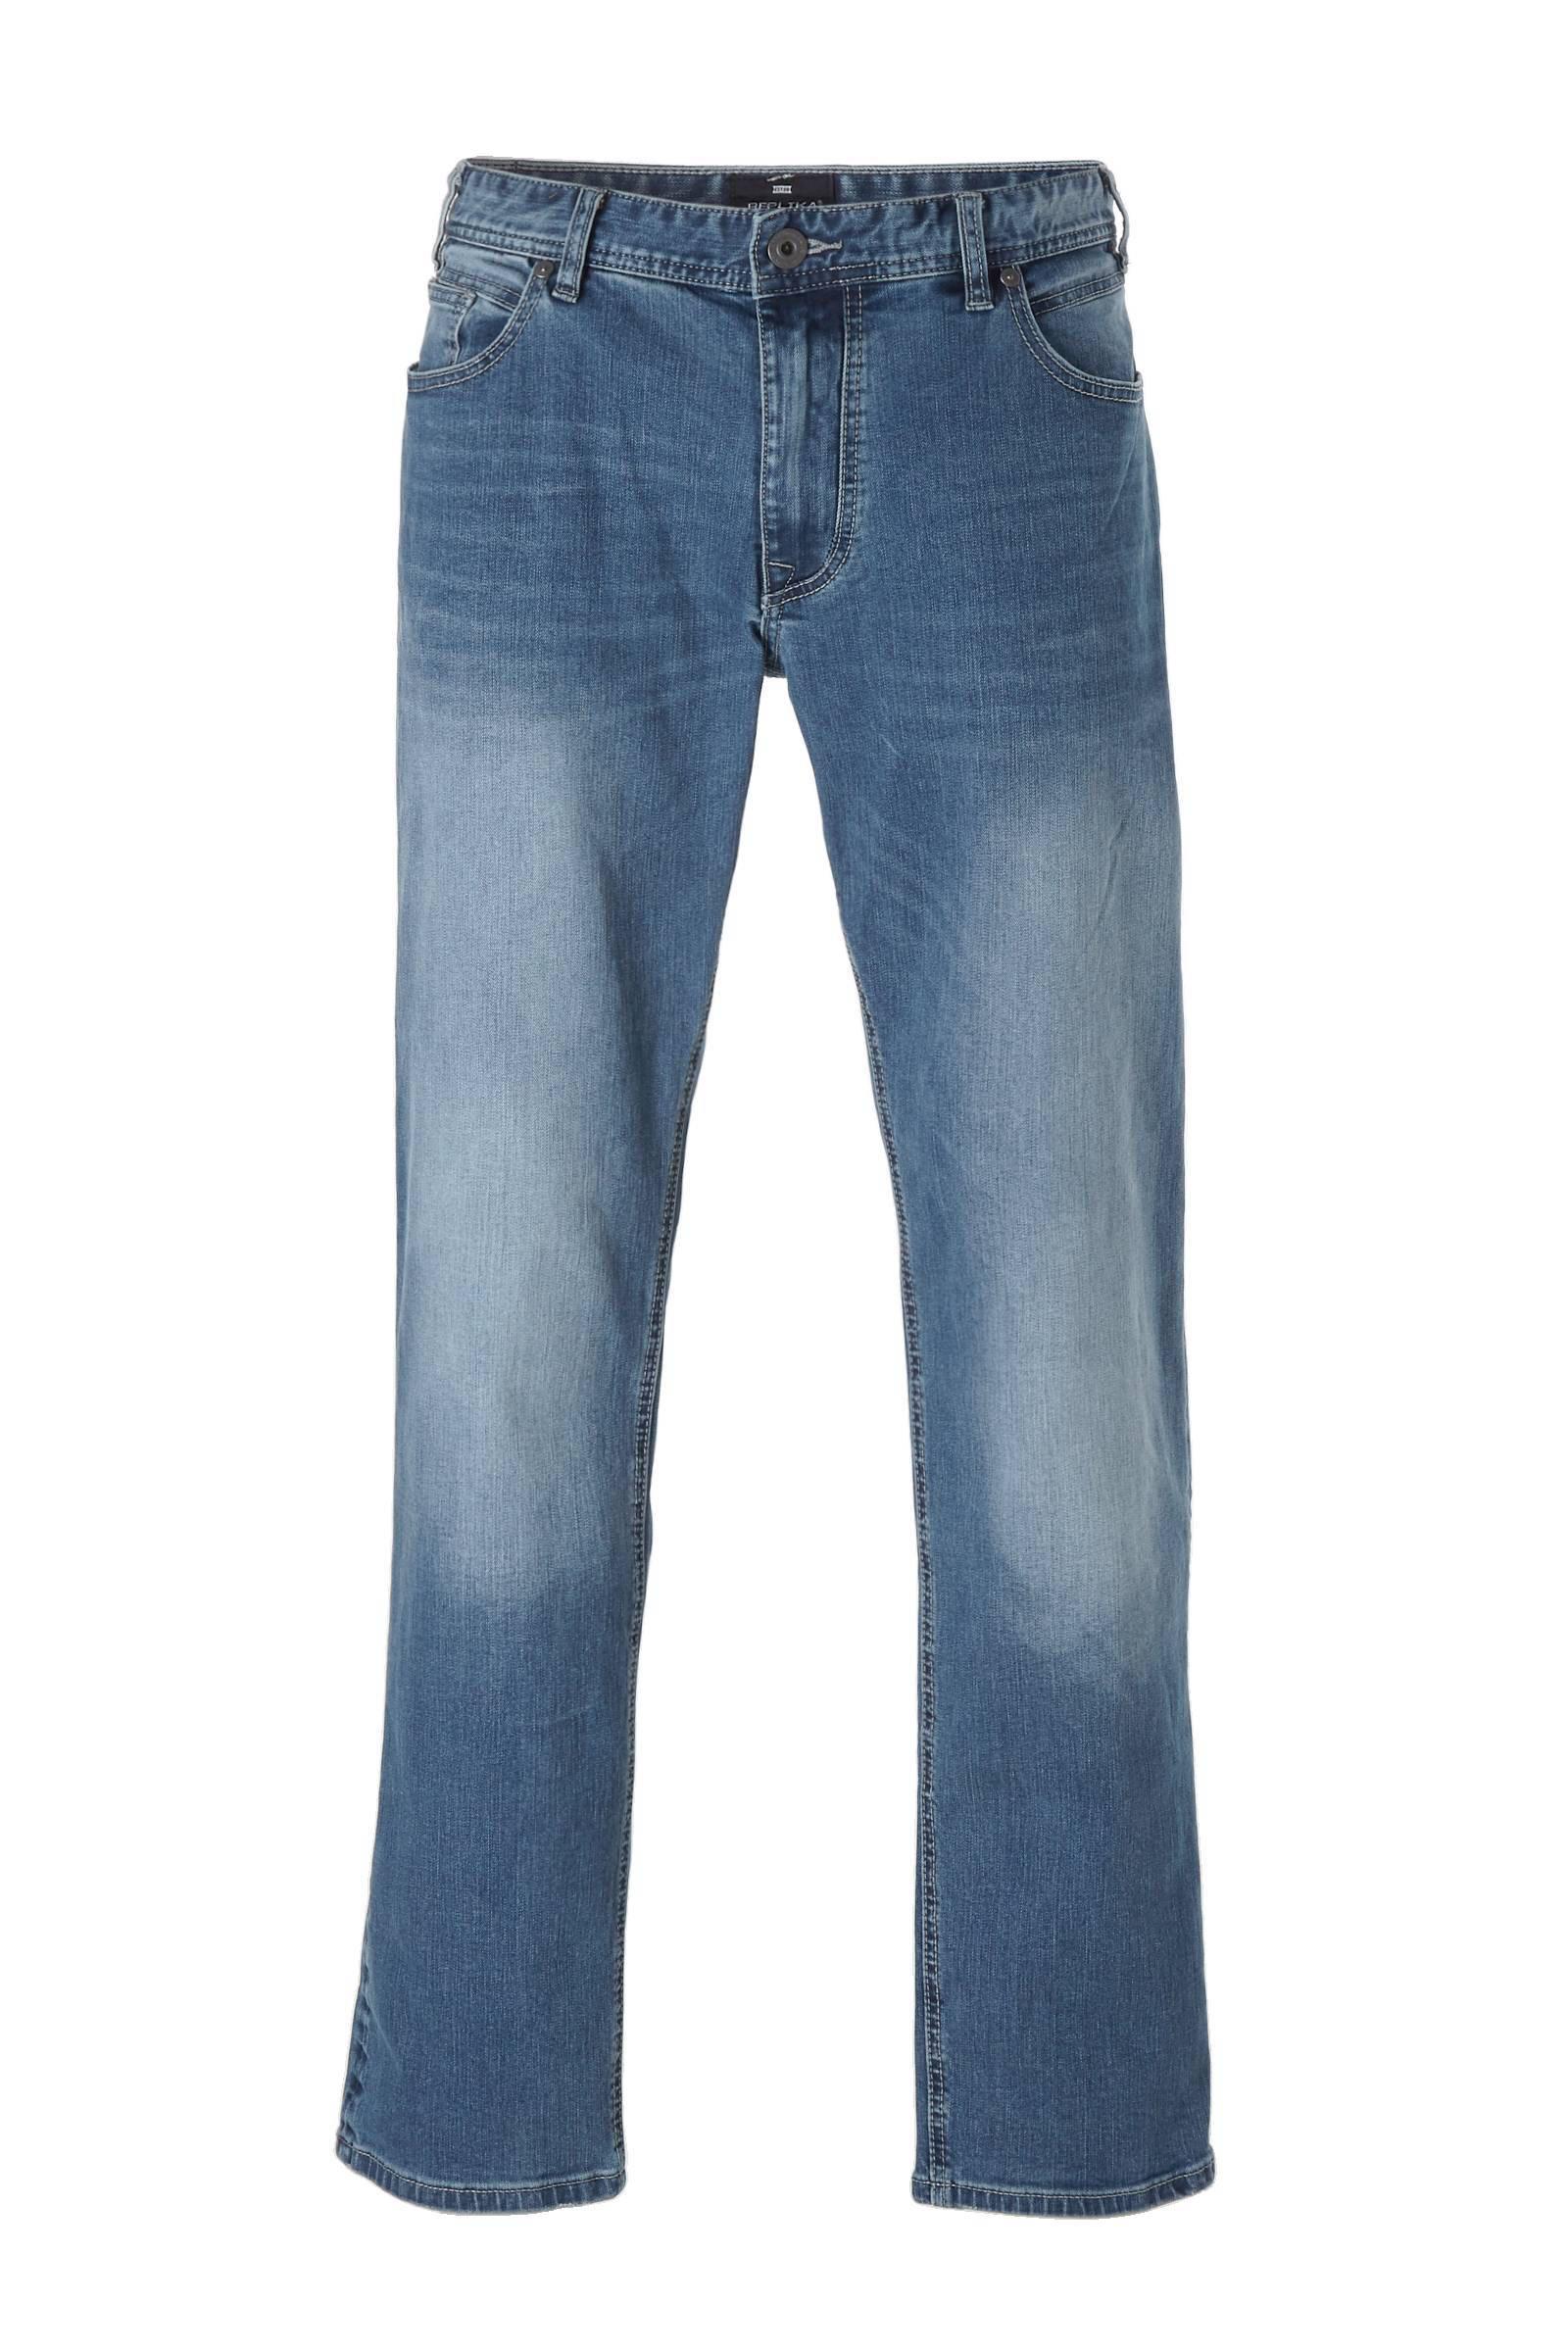 Replika +size Ringo straight fit jeans (heren)